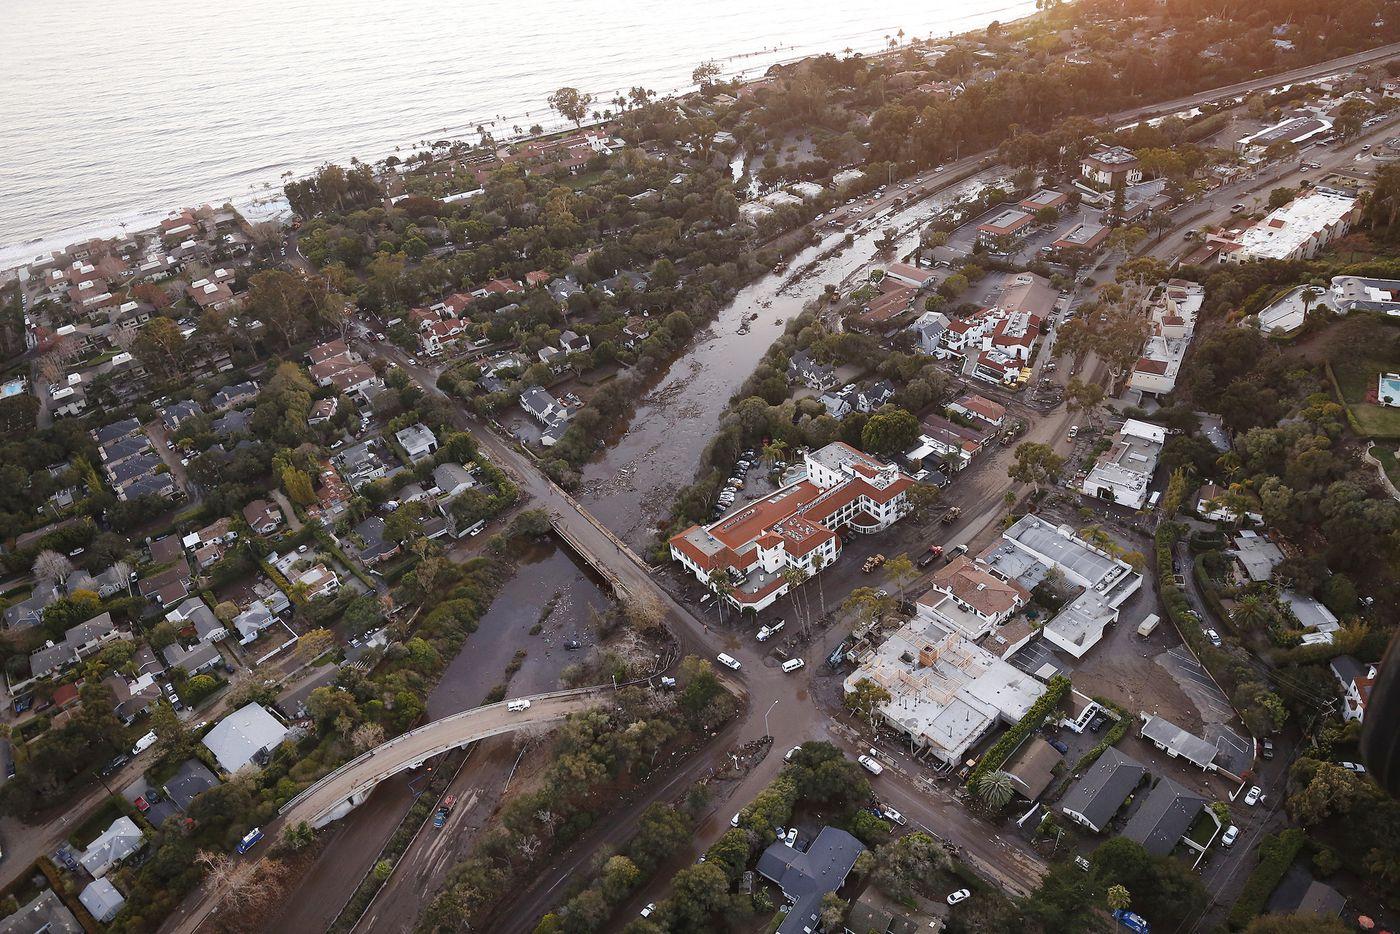 Montecito Mudslide Freeway